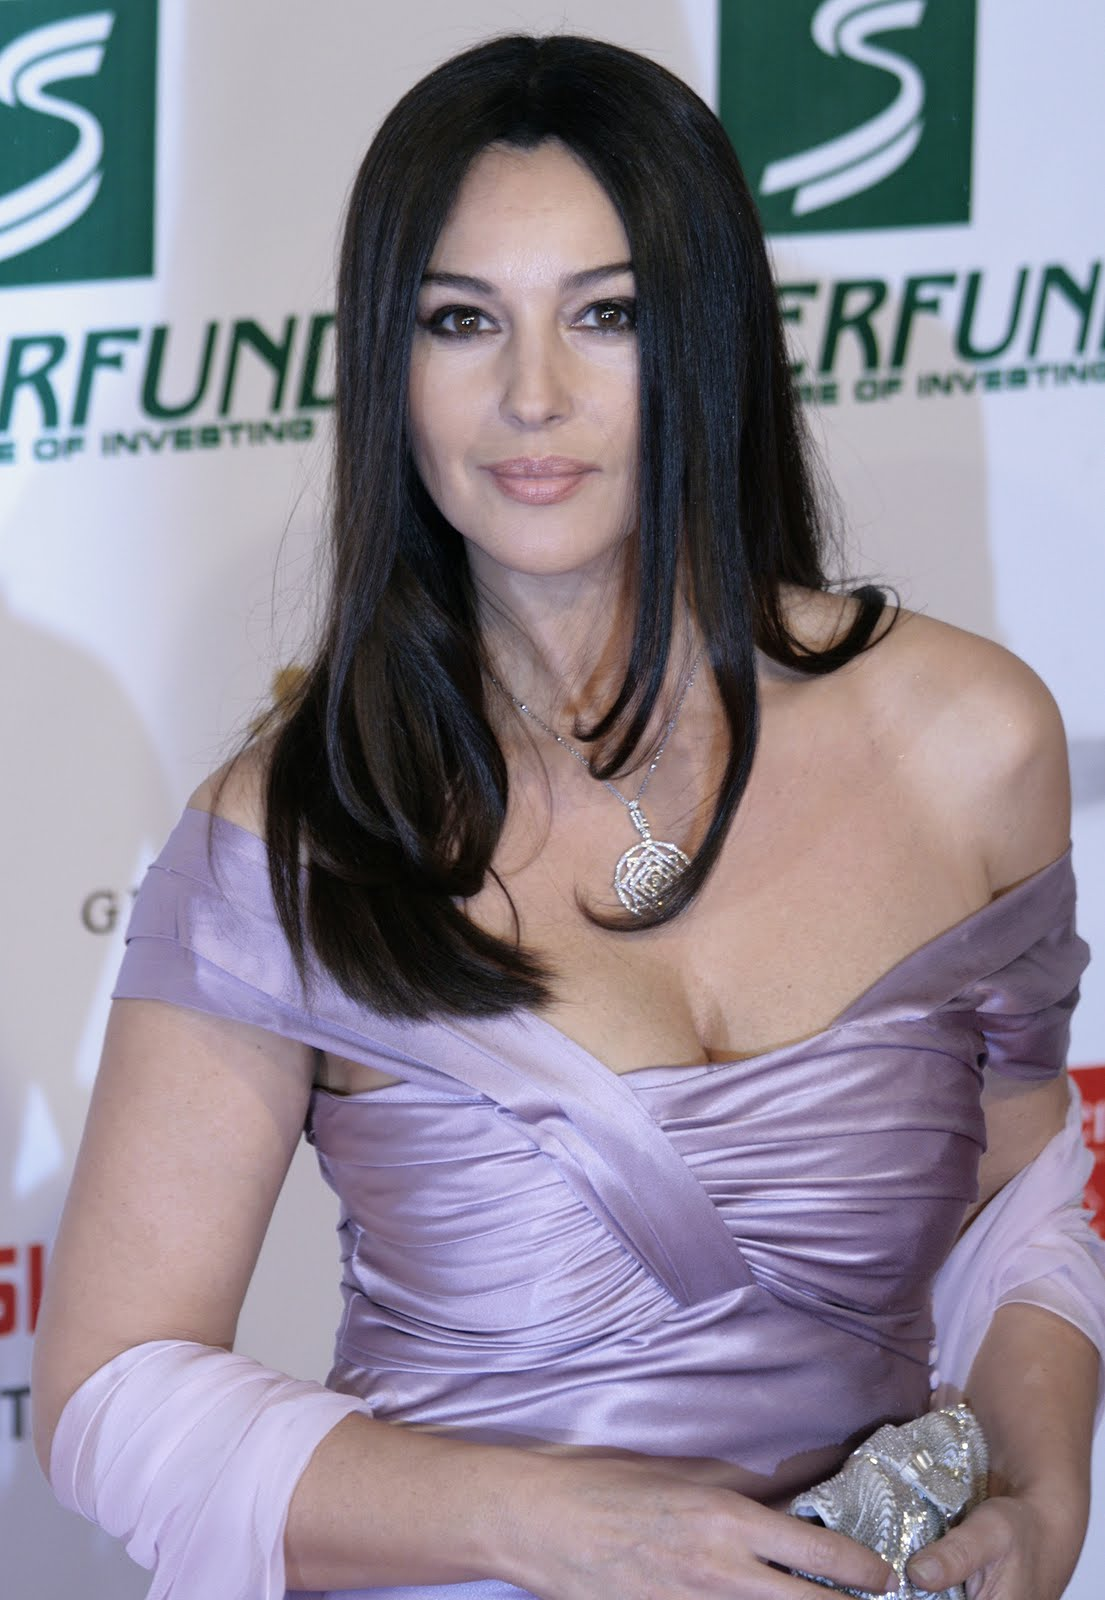 http://3.bp.blogspot.com/-qSU5TE2kZyM/ThtyEjZFuII/AAAAAAAAEOc/M1hwTd1JouQ/s1600/Monica_Bellucci%252C_Women%2527s_World_Awards_2009_a.jpg